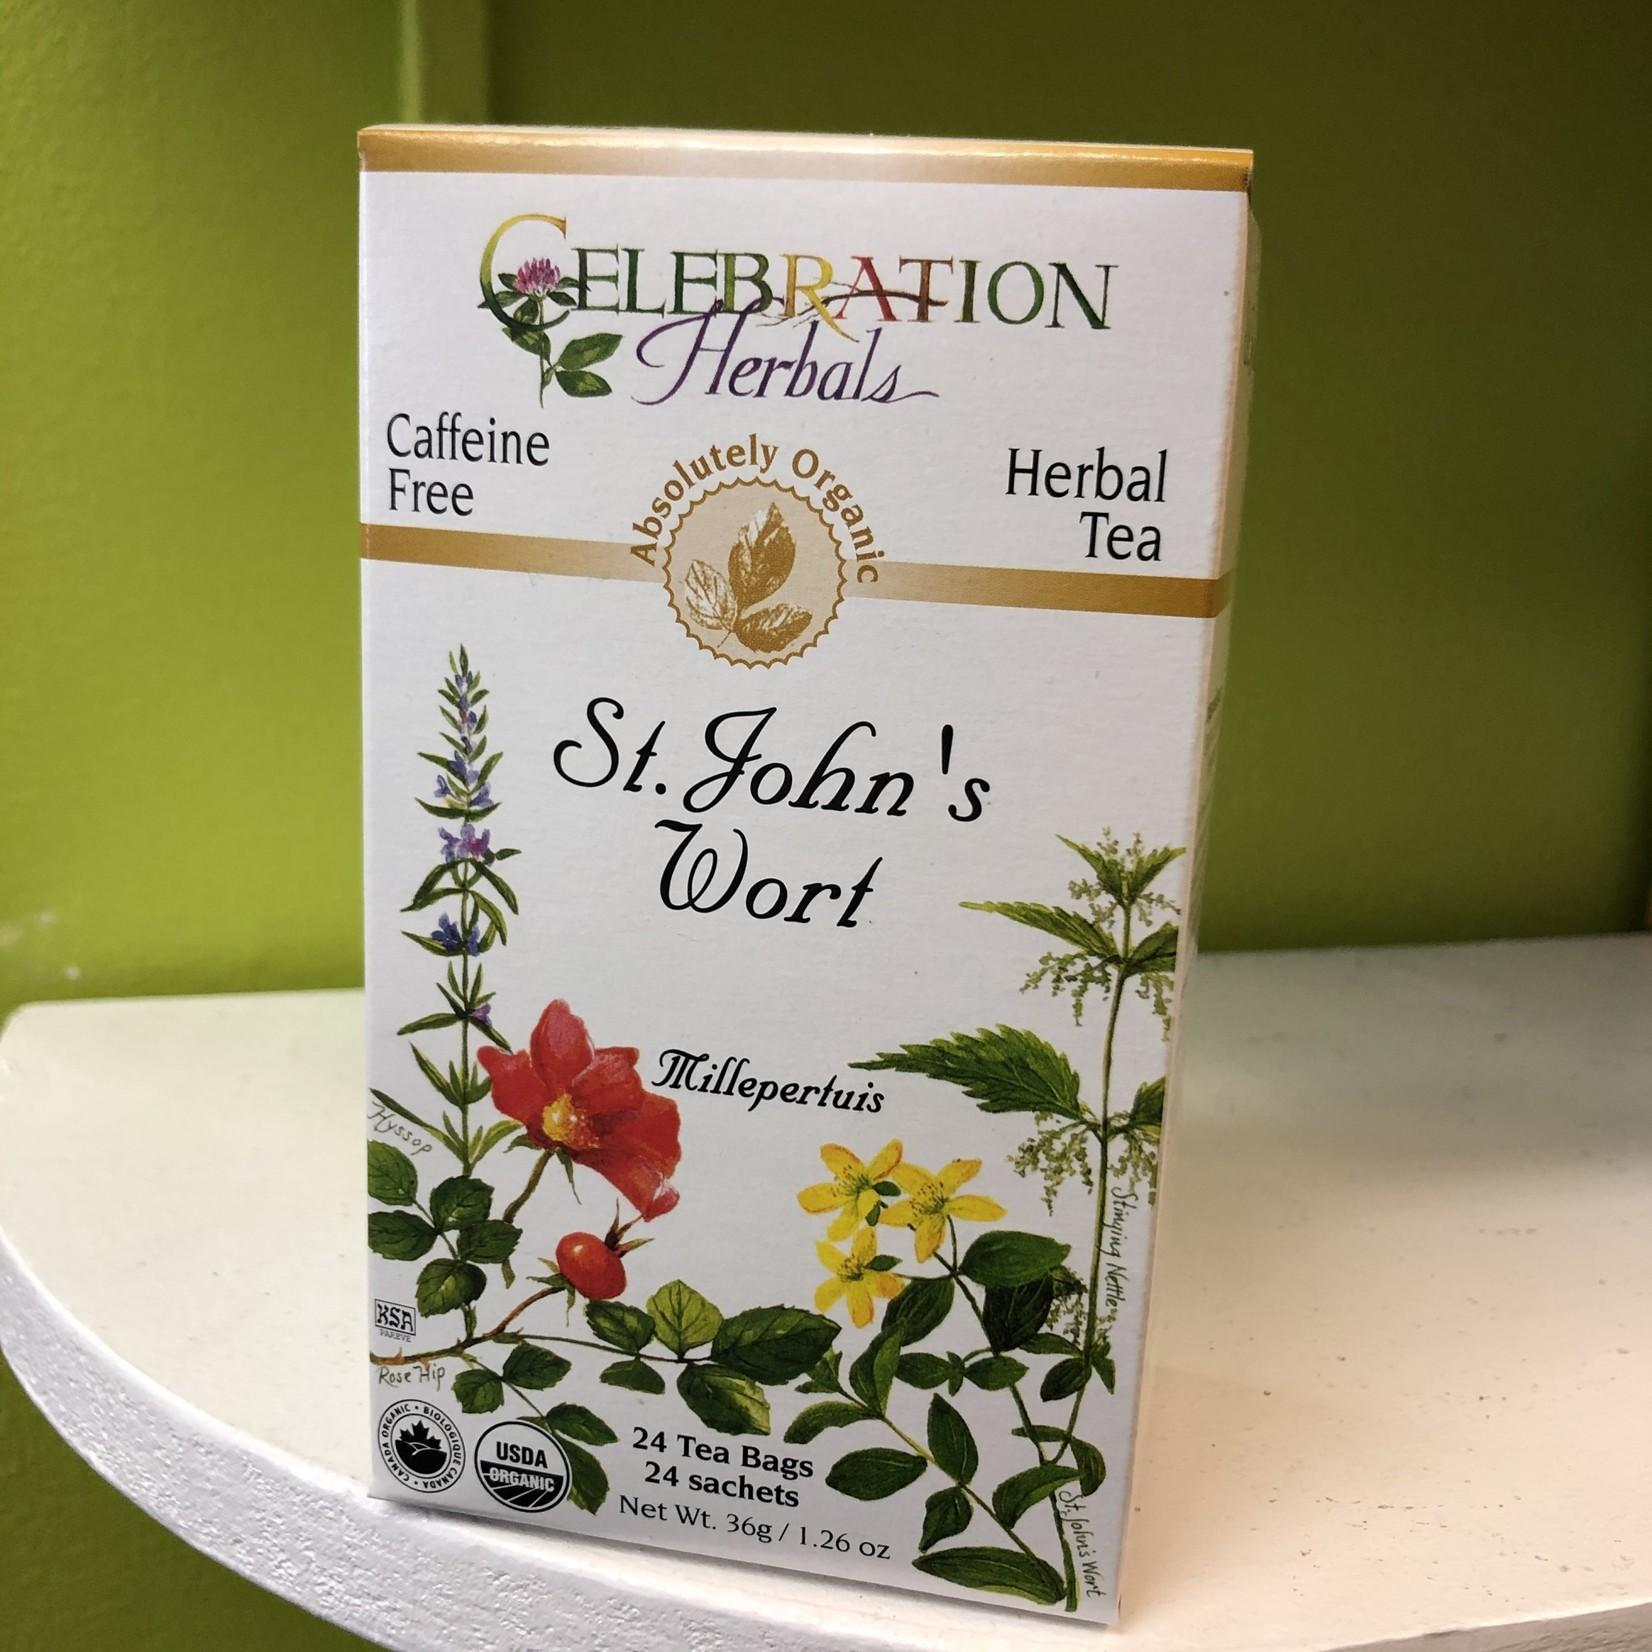 Celebration Herbals Celebration Herbals St. John's Wort 24 Tea Bags